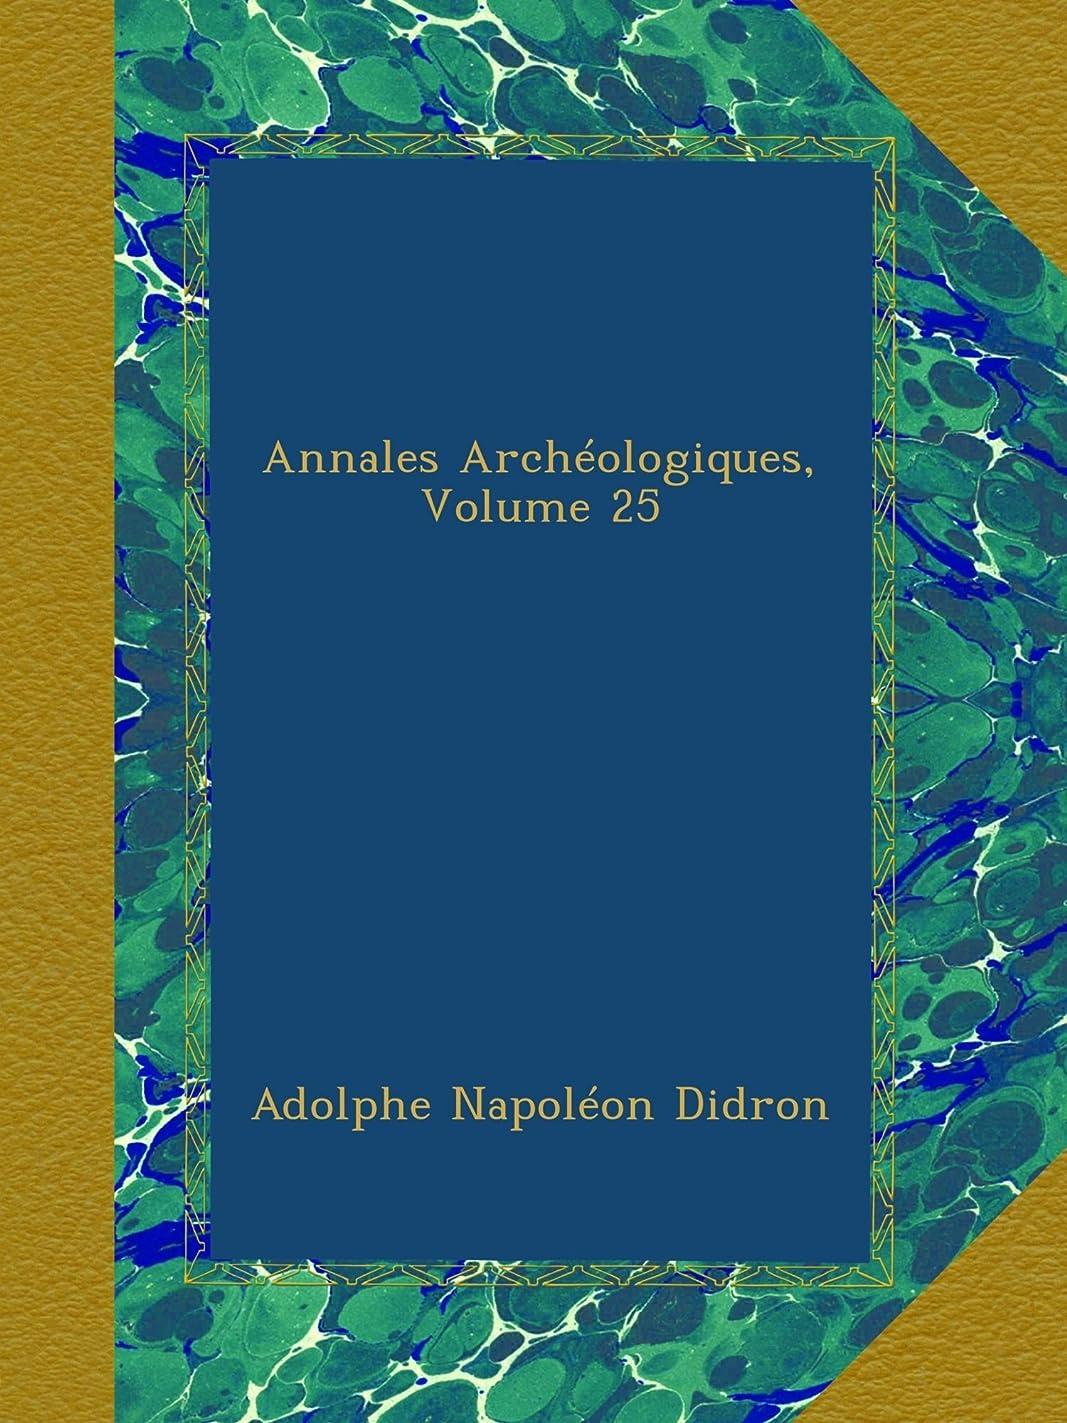 中性熟達ヒゲAnnales Archéologiques, Volume 25